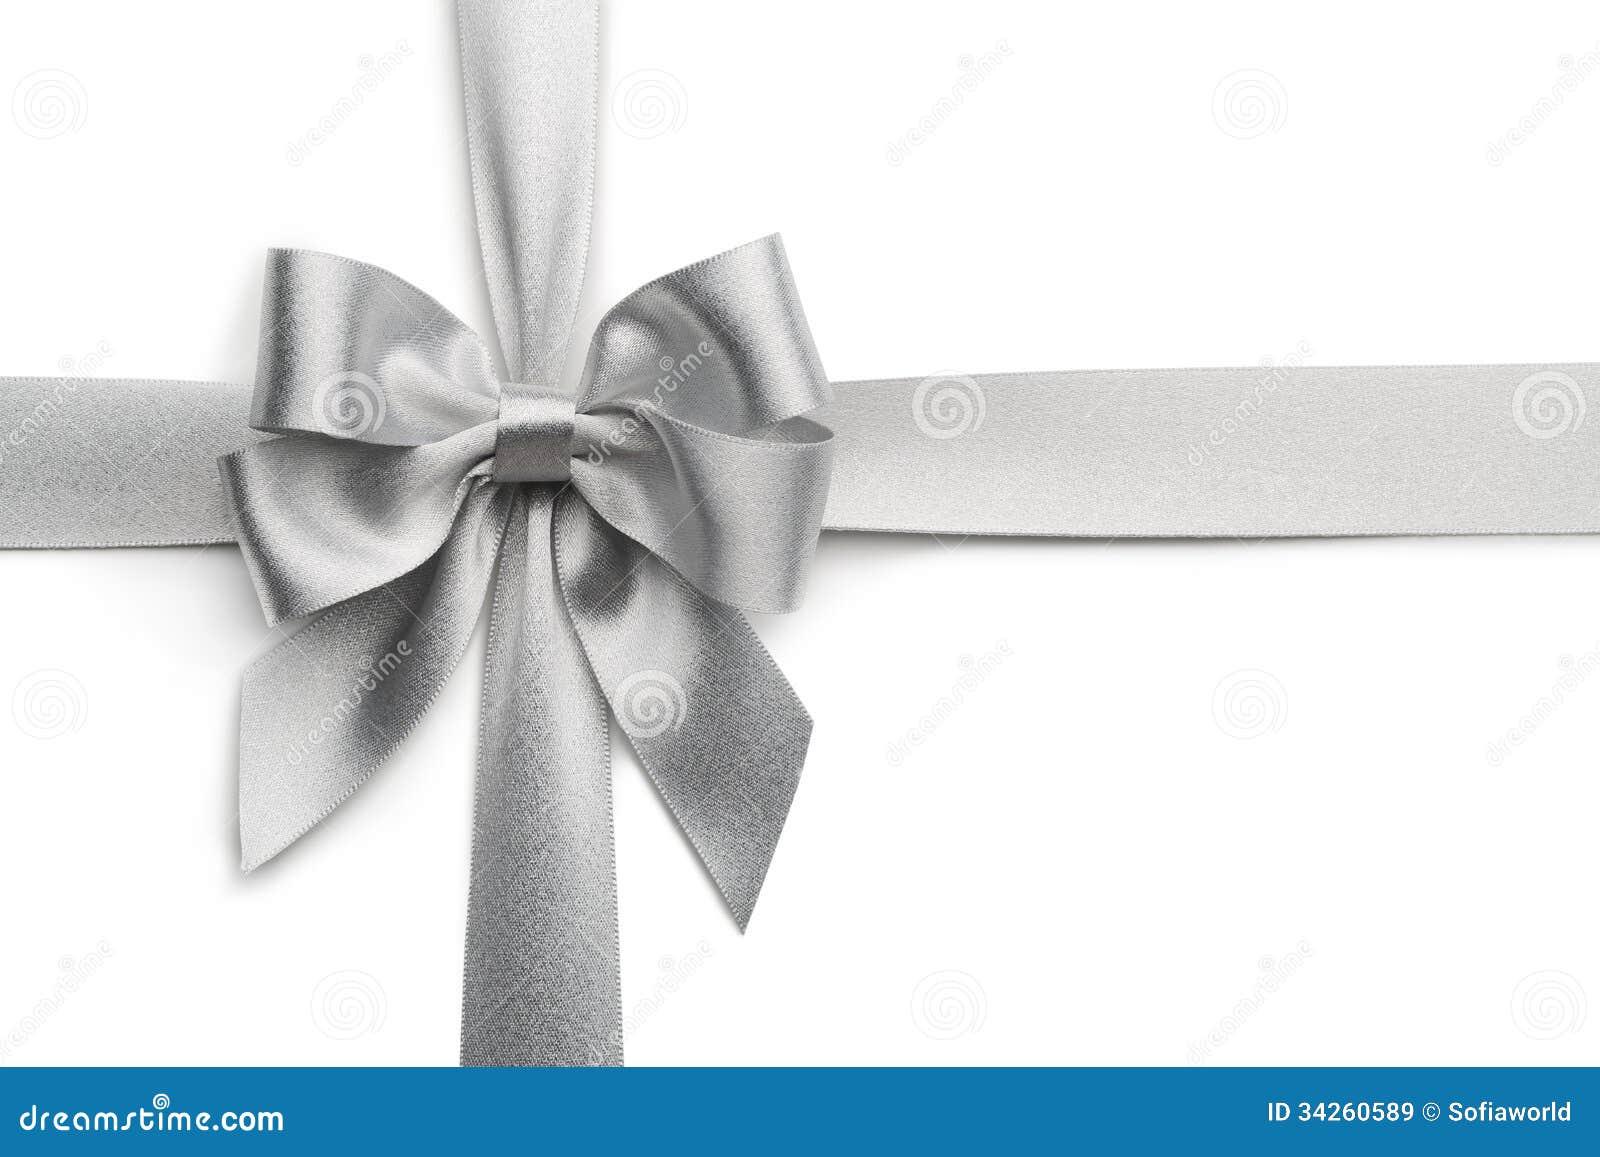 Silver ribbon bow stock image. Image of nobody, decoration ...  Silver ribbon b...